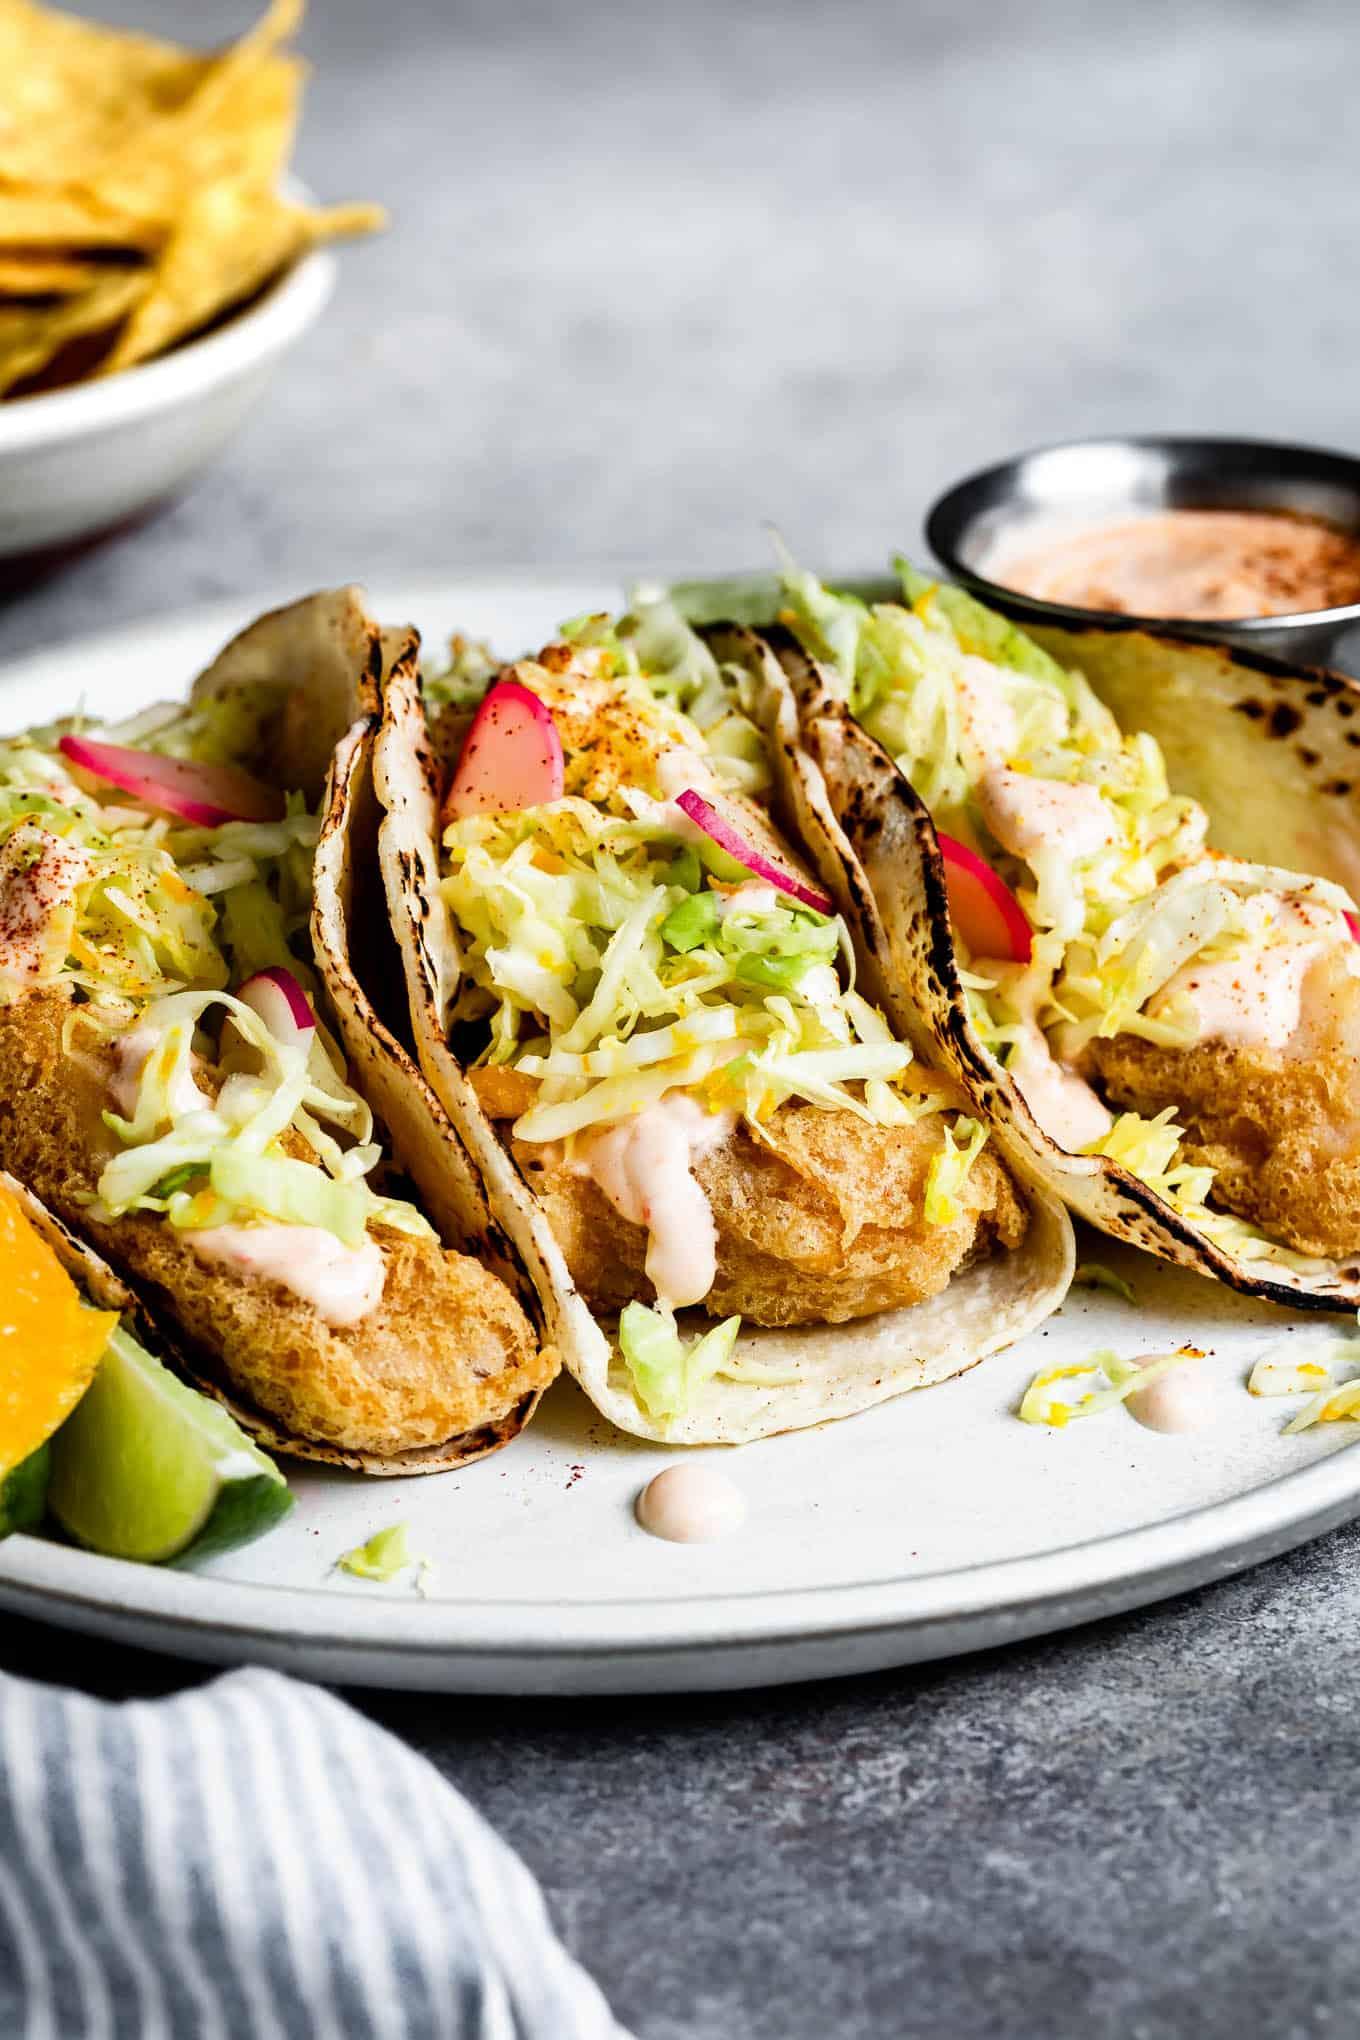 Gluten-Free Baja Fish Tacos